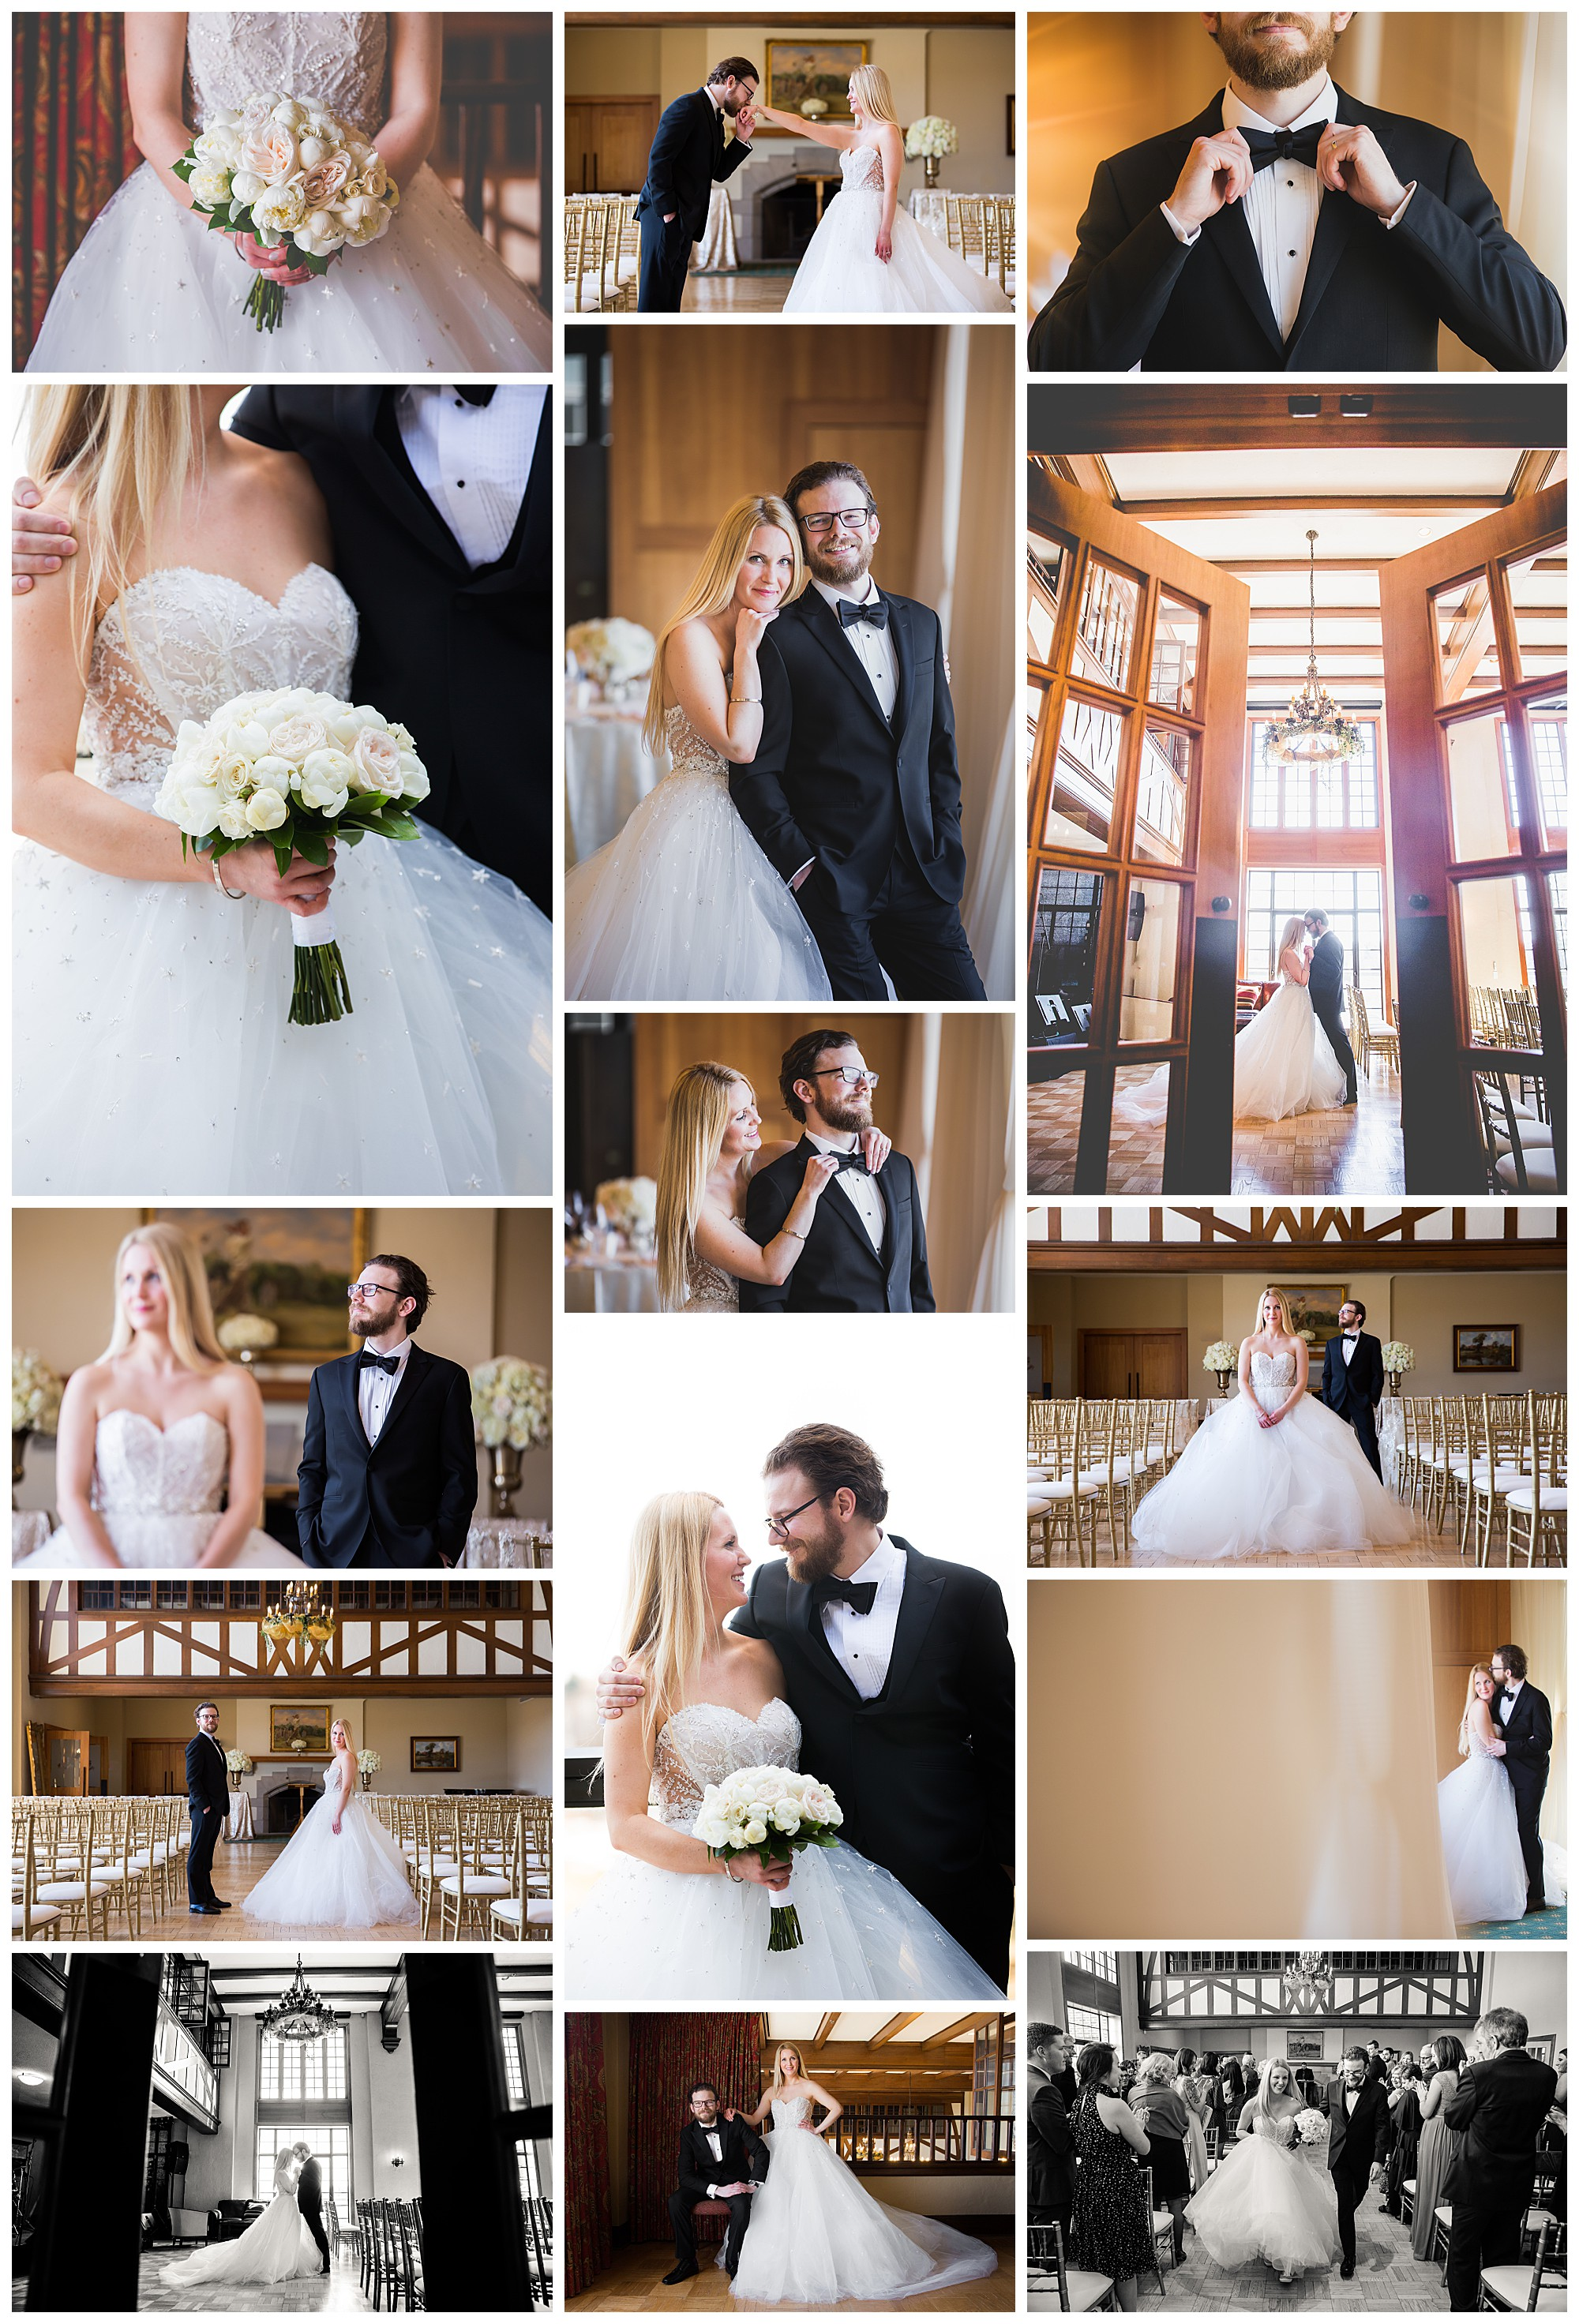 Hamilton Golf & Country Club, Ancaster Ontario wedding photos by VanDaele & Russell